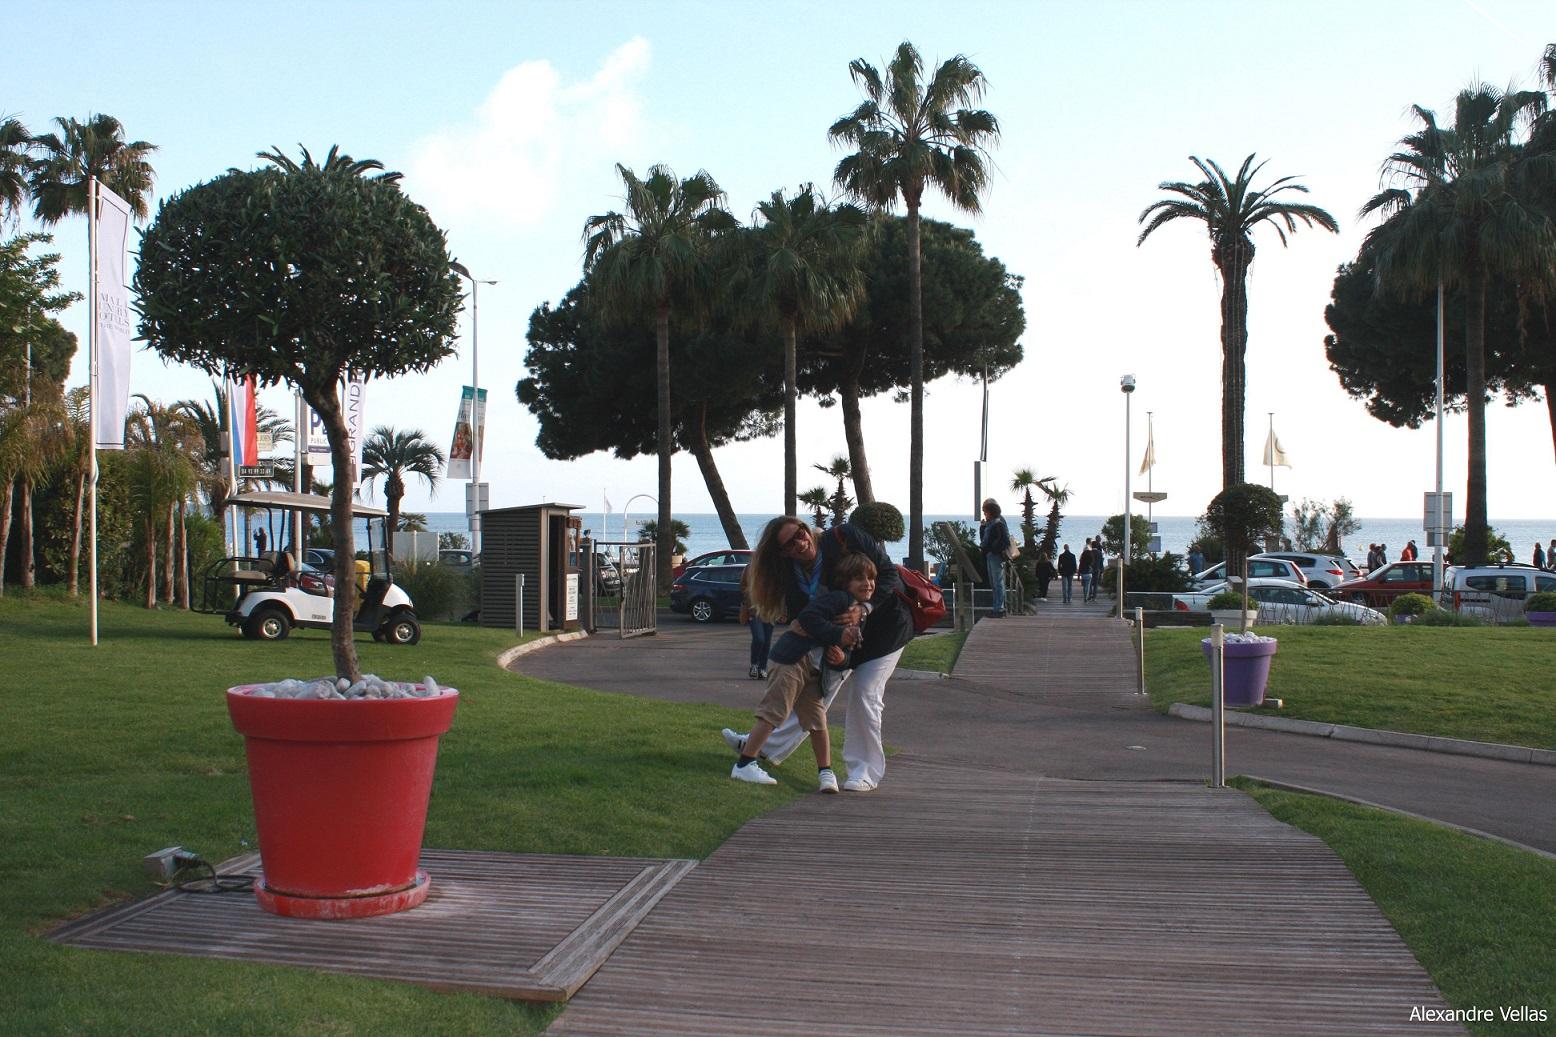 Stile e moda a Cannes les jardins du Grand Hotel